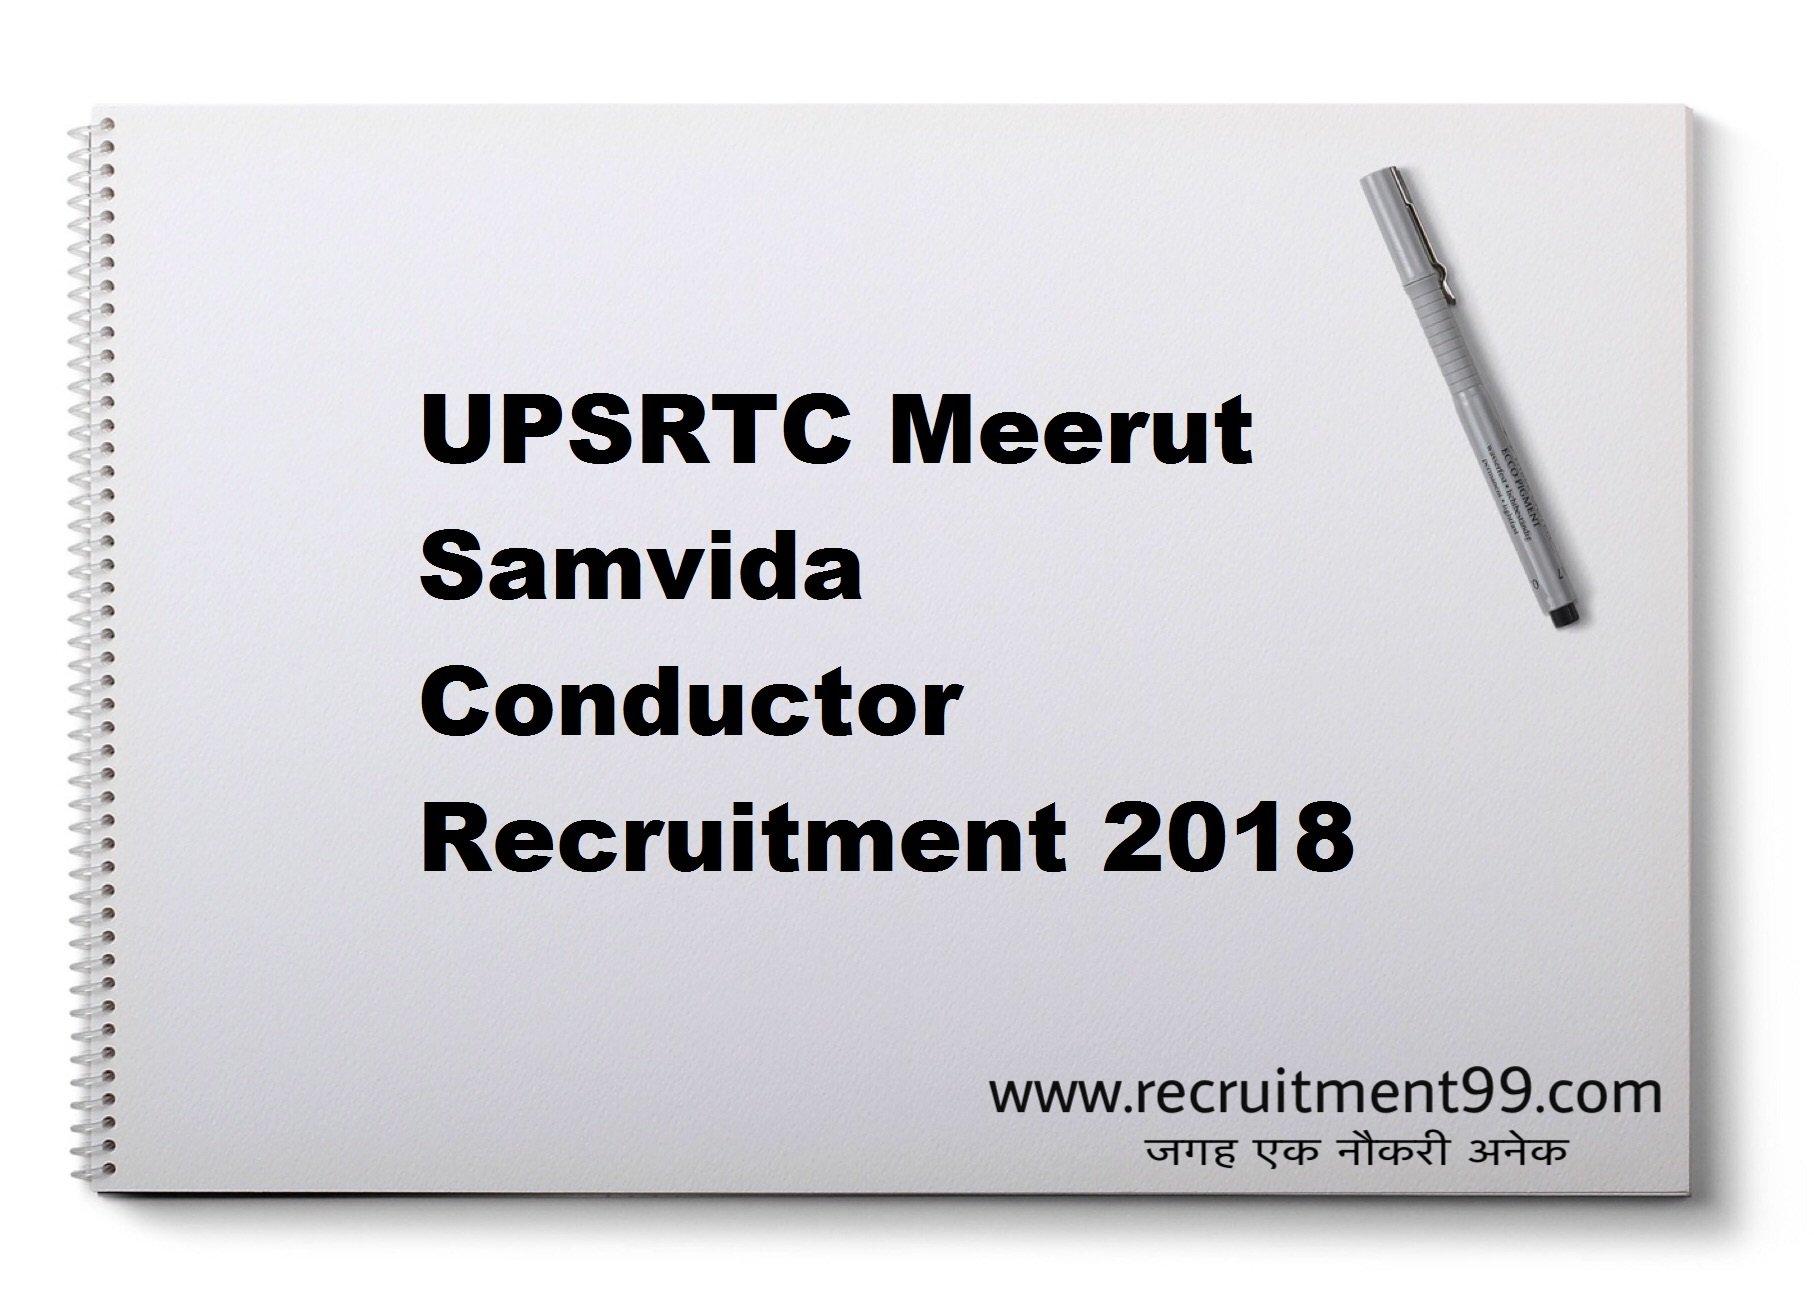 UPSRTC Meerut Samvida Conductor Recruitment Admit Card Result 2018